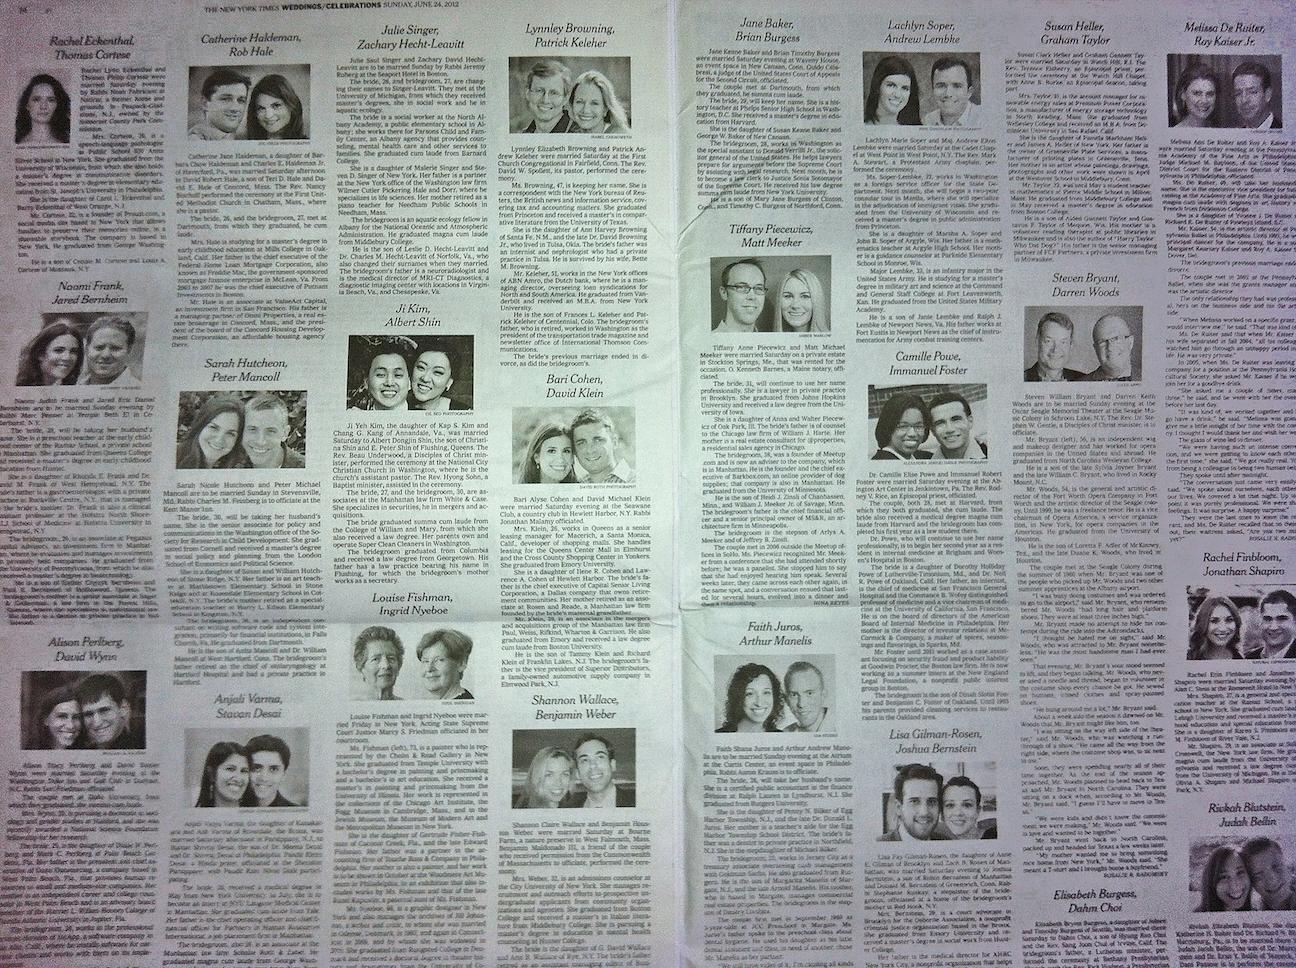 New York Times Weddings